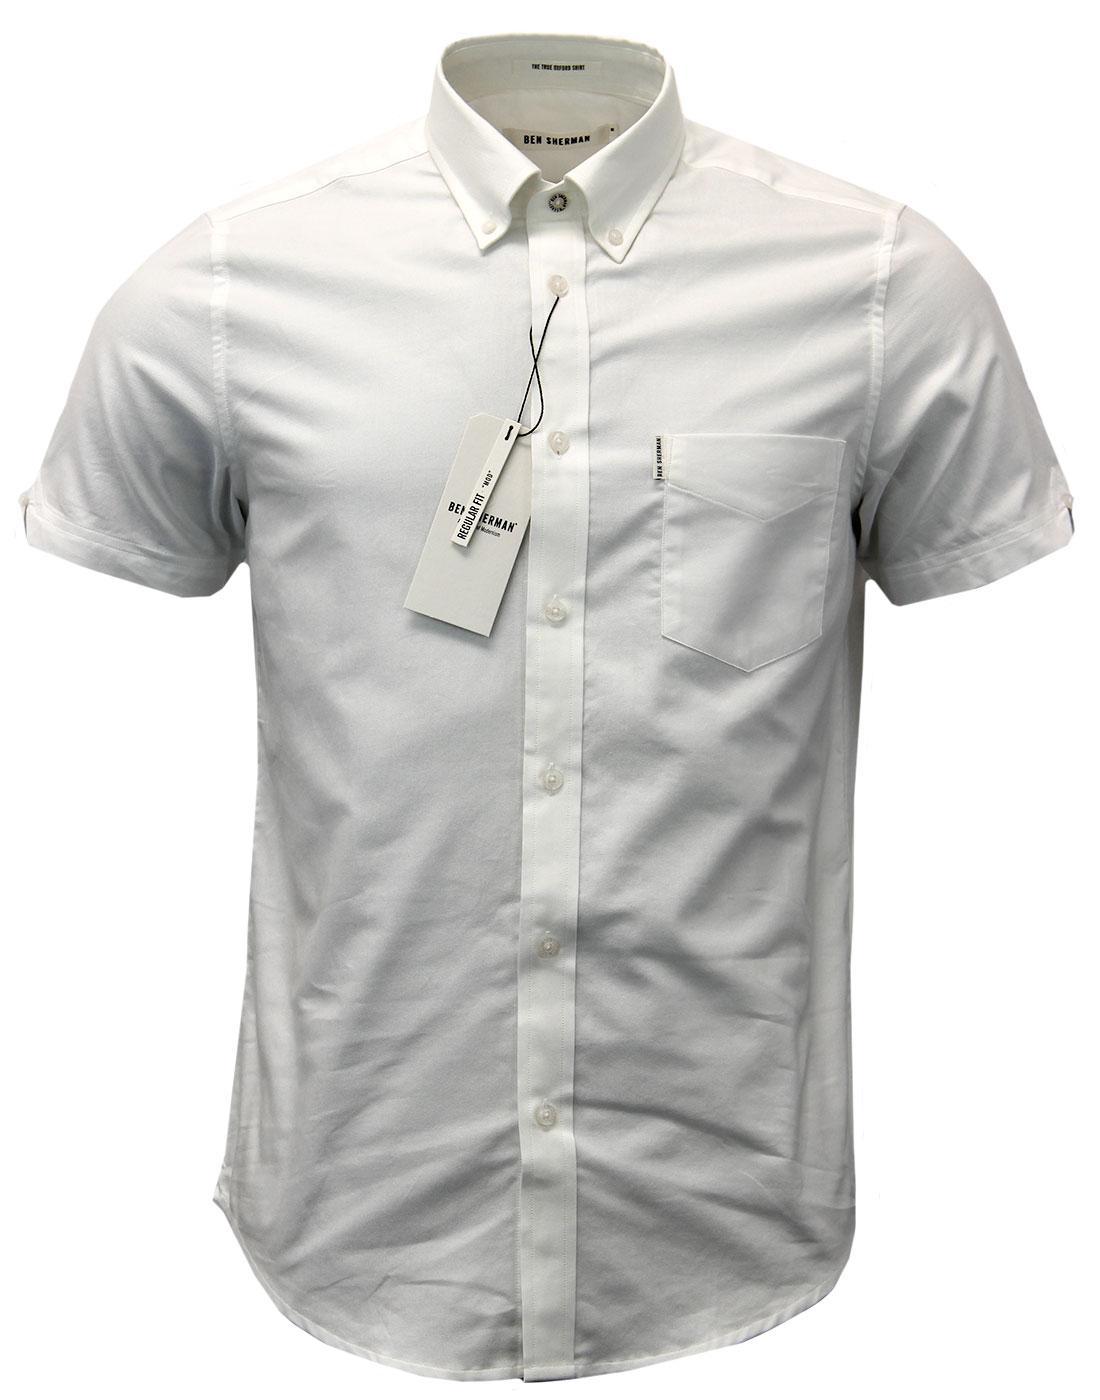 BEN SHERMAN Retro Mod S/S True Oxford Shirt (BW)